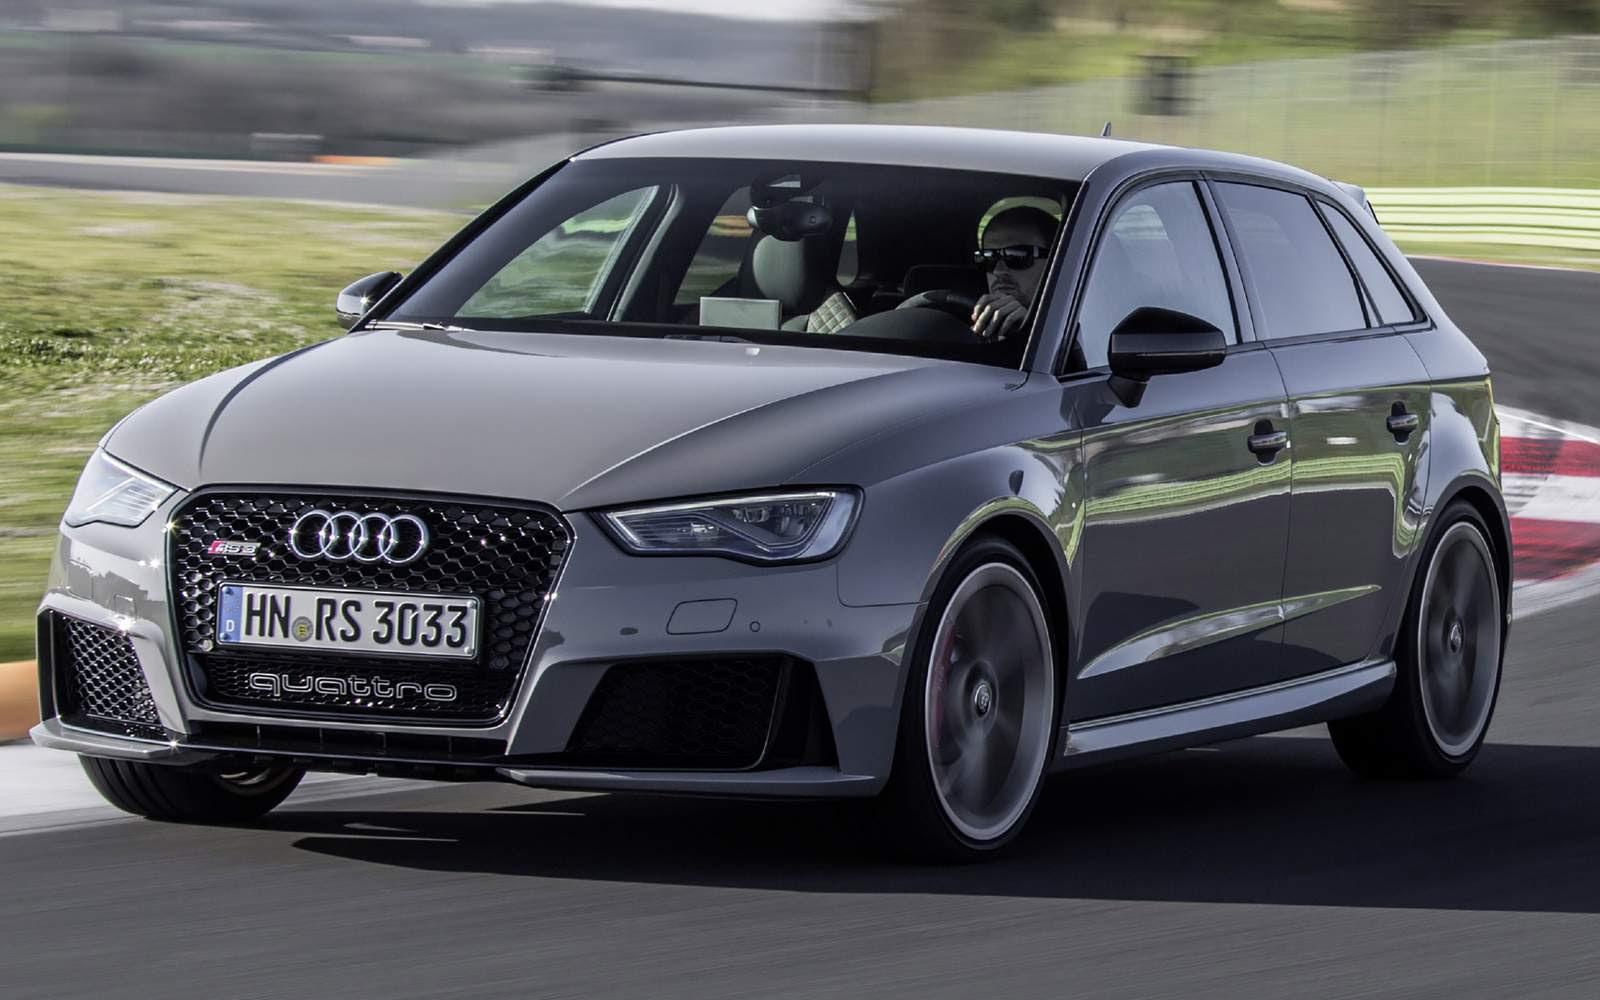 Kelebihan Kekurangan Audi Rs3 2016 Review